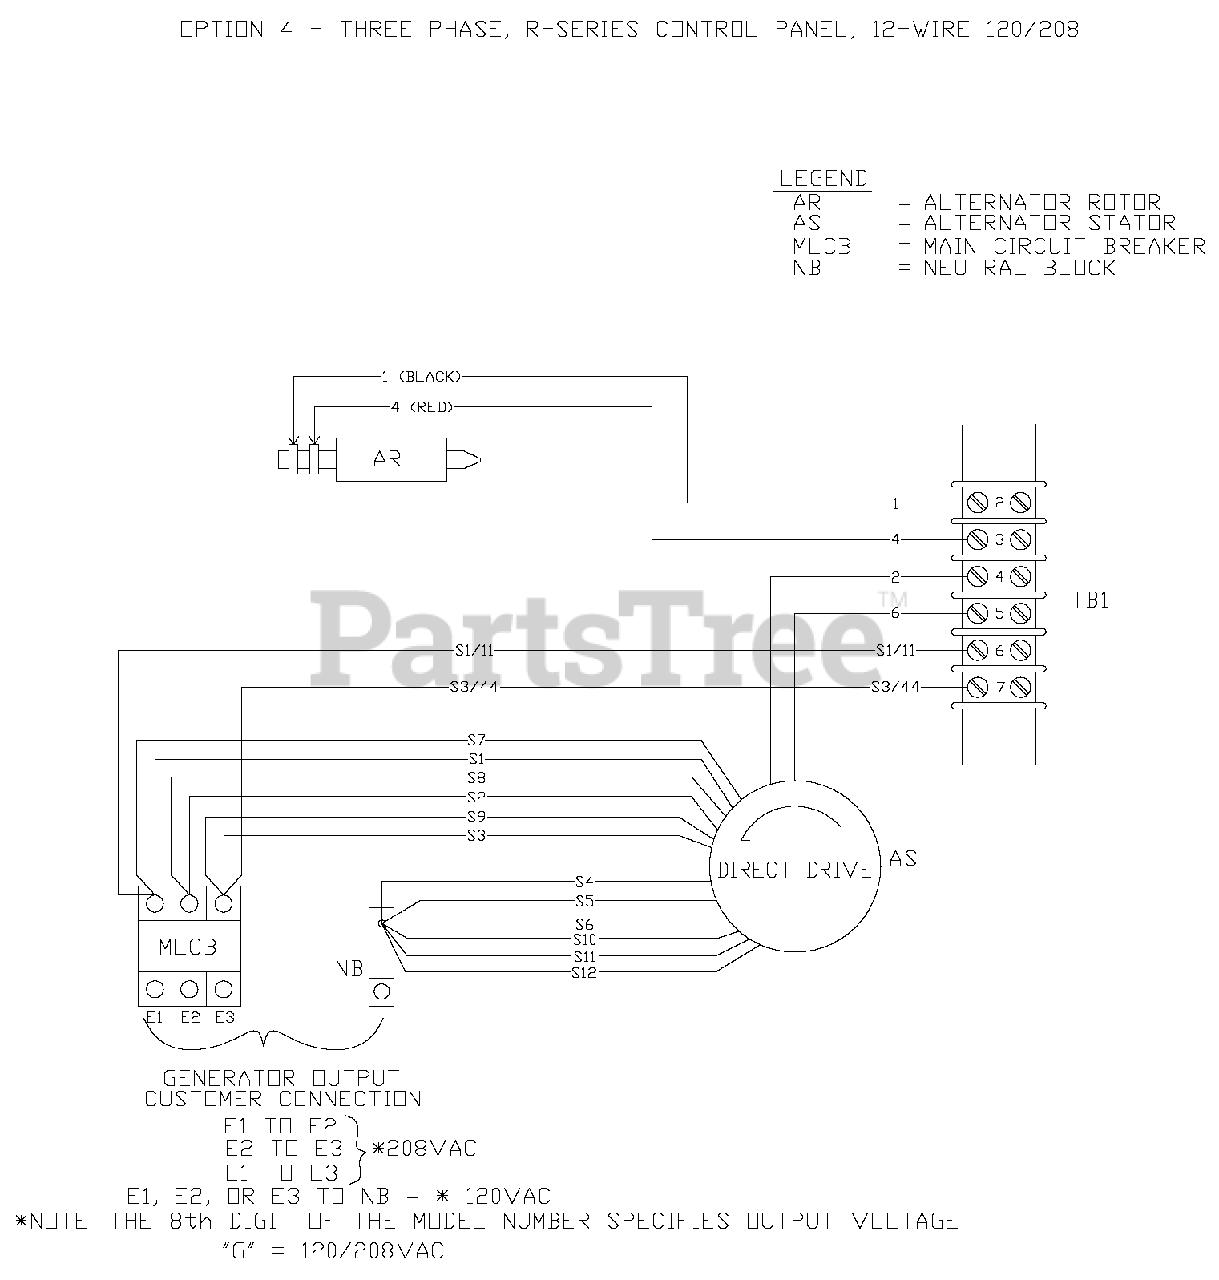 Generac QT03016JNSN - Generac 30kW Home Standby Generator (SN: 5601393 -  5667160) (2009) Wiring Diagram (0F6839) Parts Lookup with Diagrams |  PartsTree | Generac 30 Kw Wiring Diagram |  | PartsTree